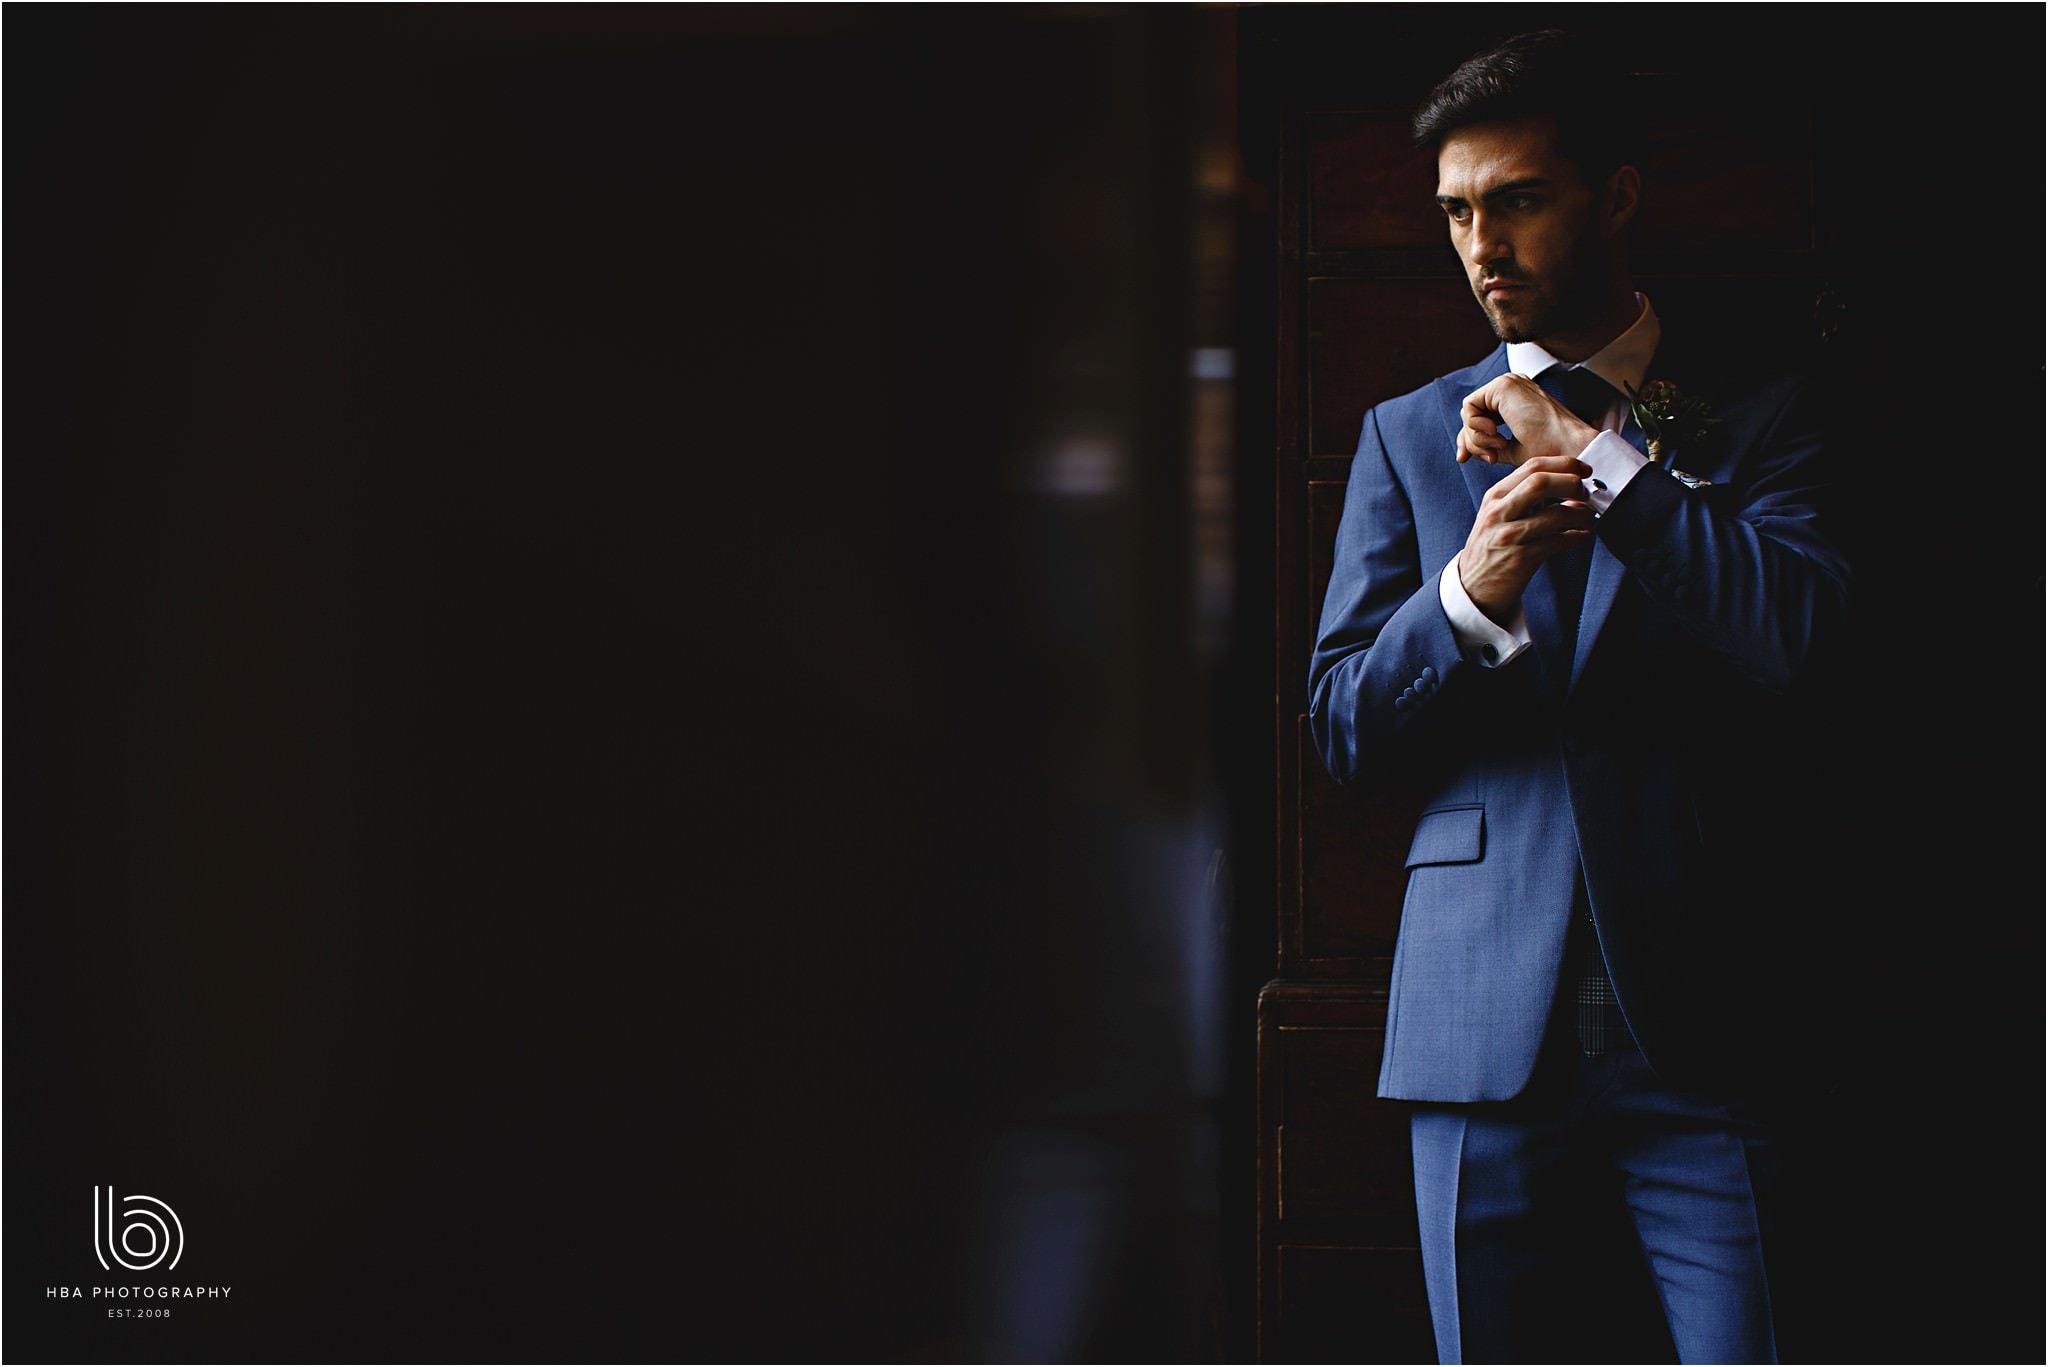 the groom stood in window light in a blue suit